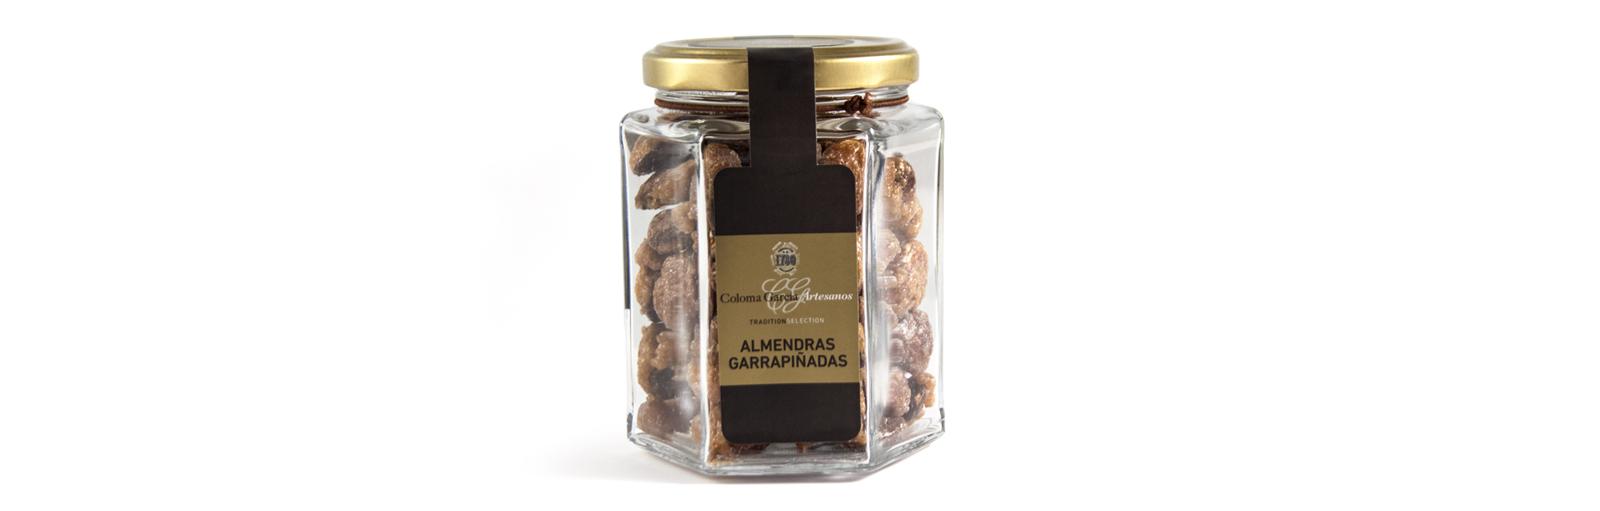 ALMENDRAS GARRAPIÑADAS